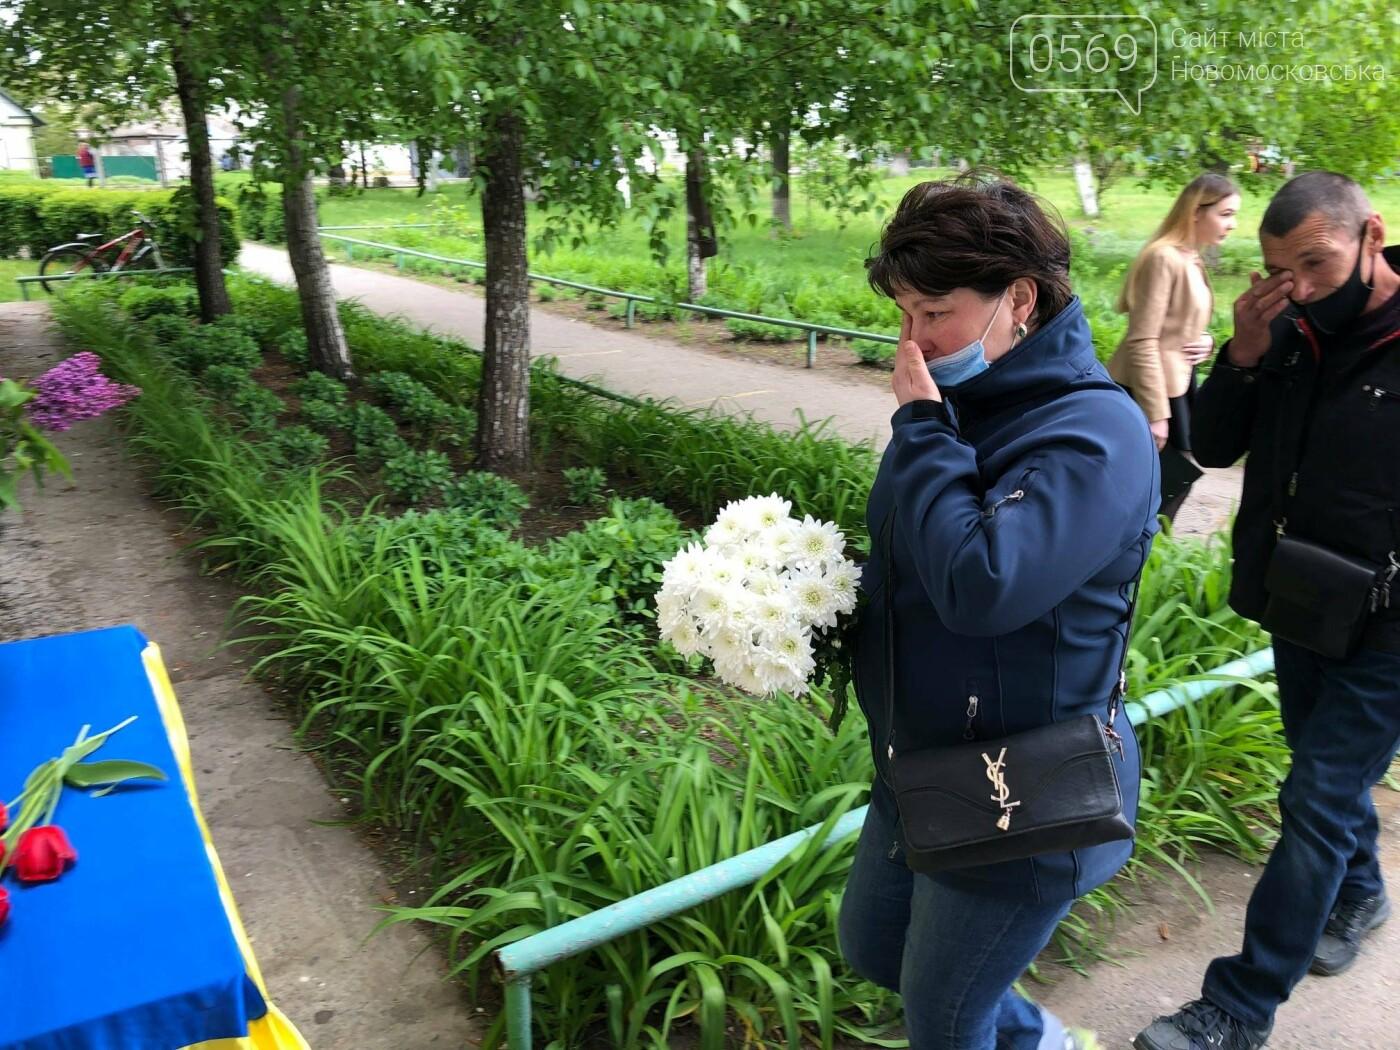 У Новомосковську вшанували пам'ять учасника АТО Максима Полежаєва, фото-1